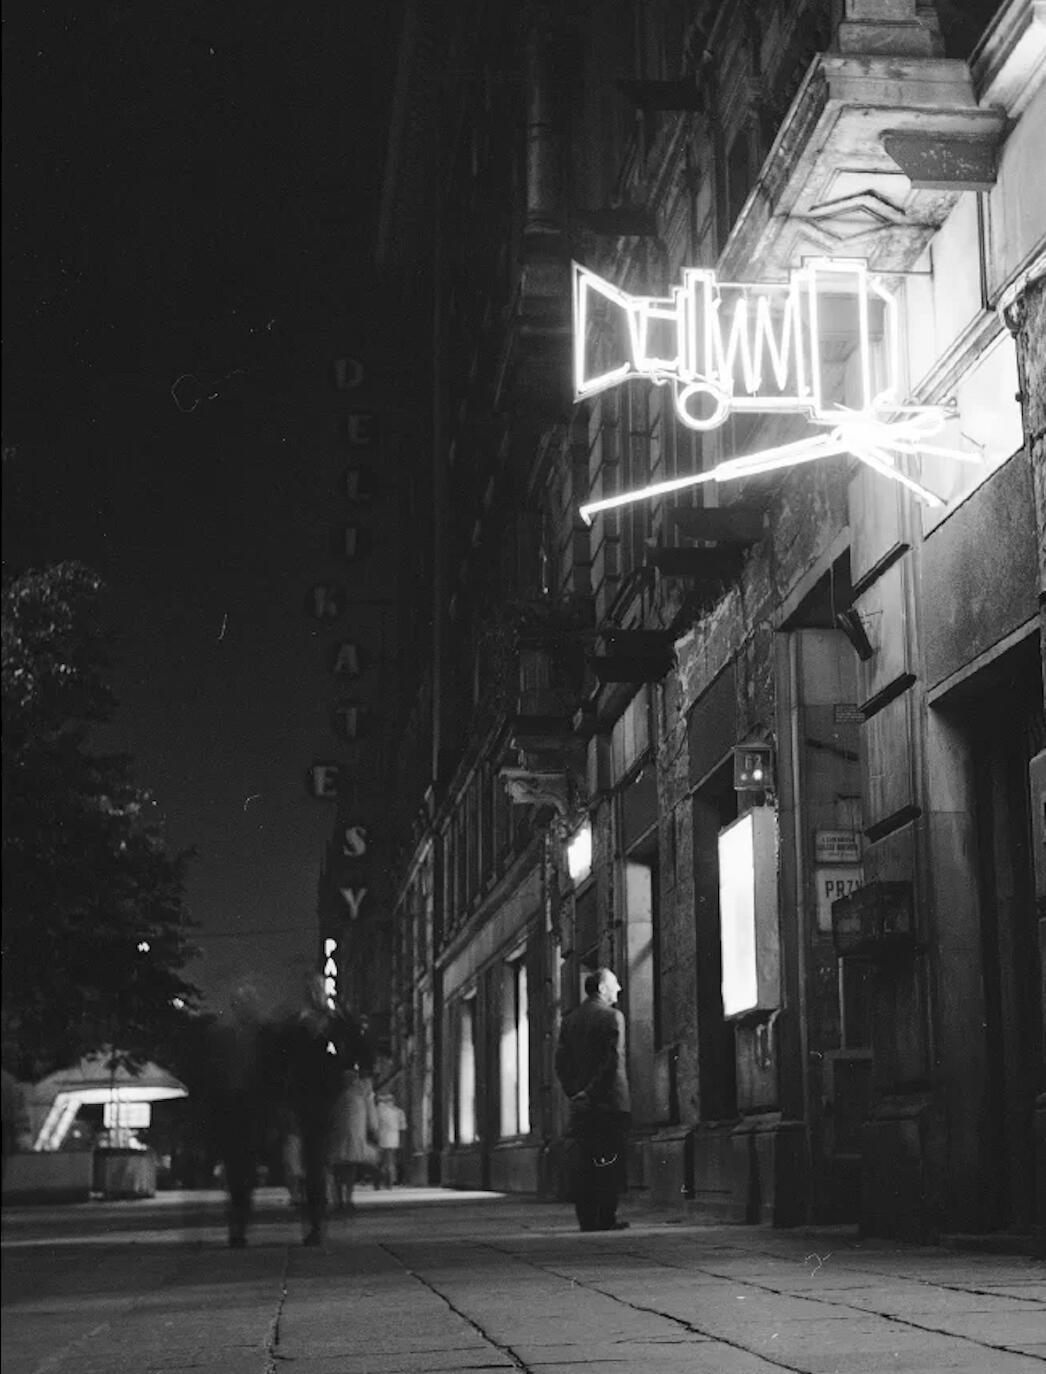 Neon Fotografa - Afish | JestemSlow.pl